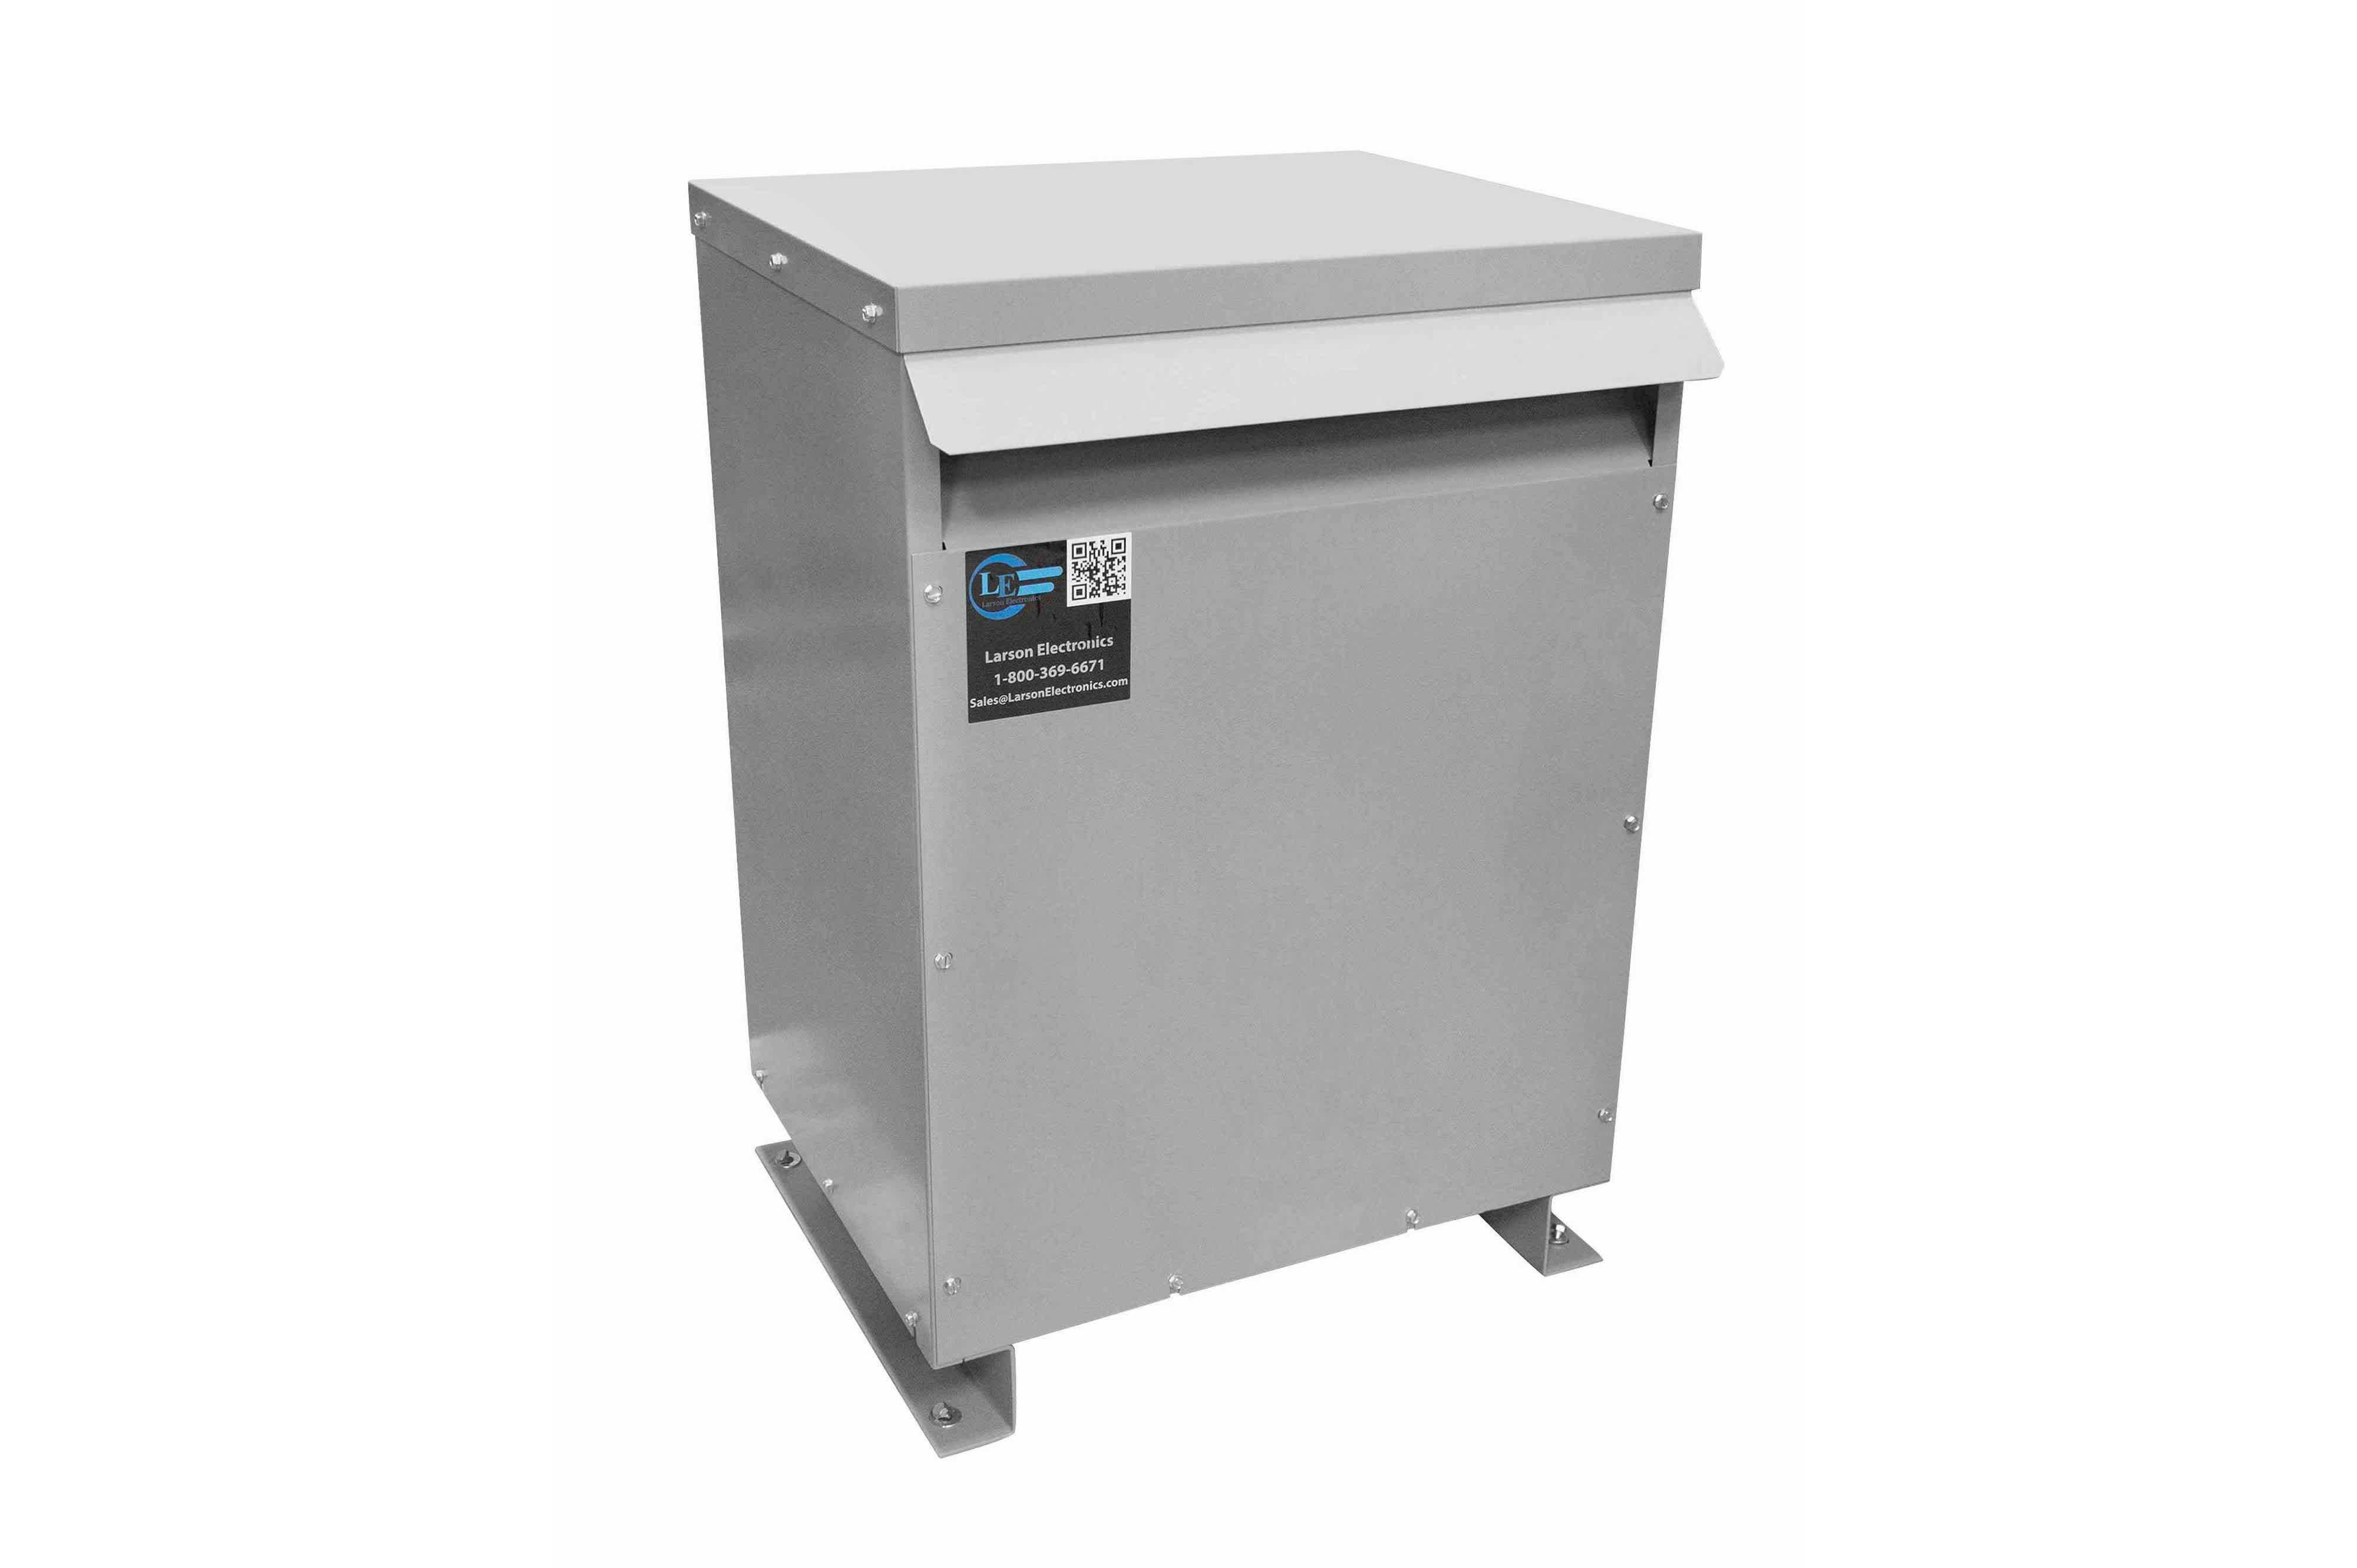 115 kVA 3PH Isolation Transformer, 400V Wye Primary, 240V Delta Secondary, N3R, Ventilated, 60 Hz